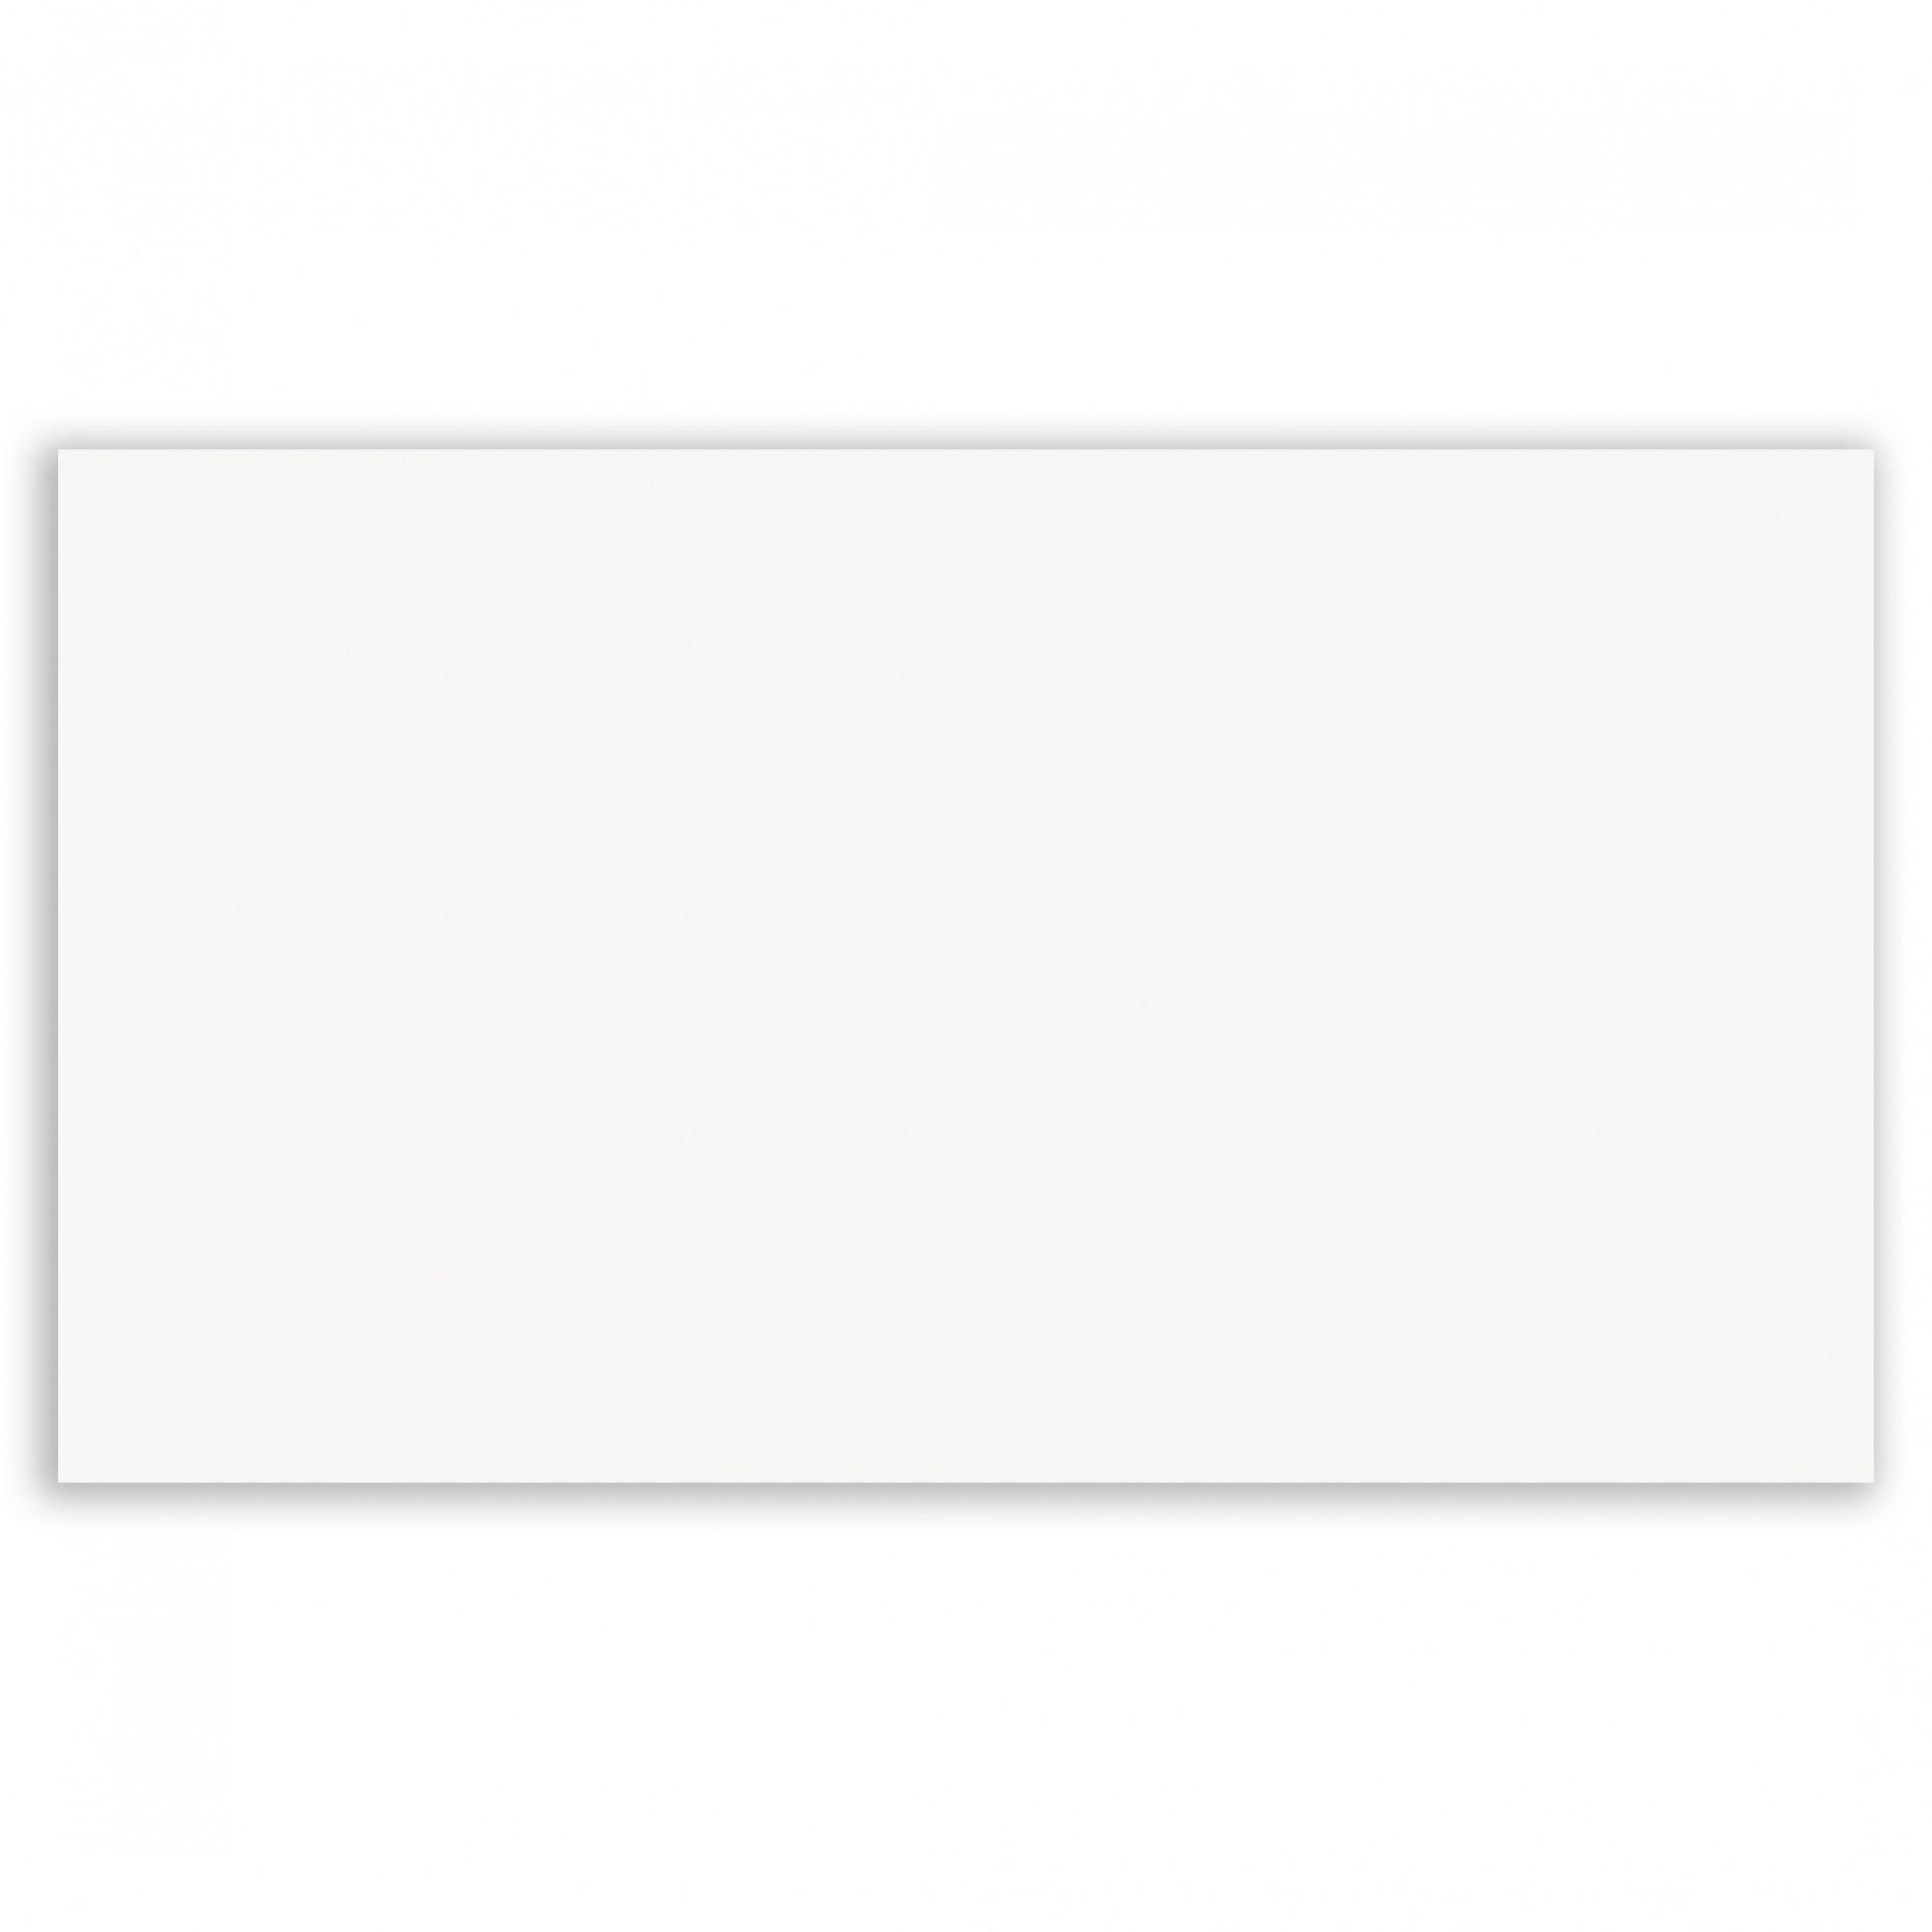 Revestimento White Absolute 33x60 Cx.2,43